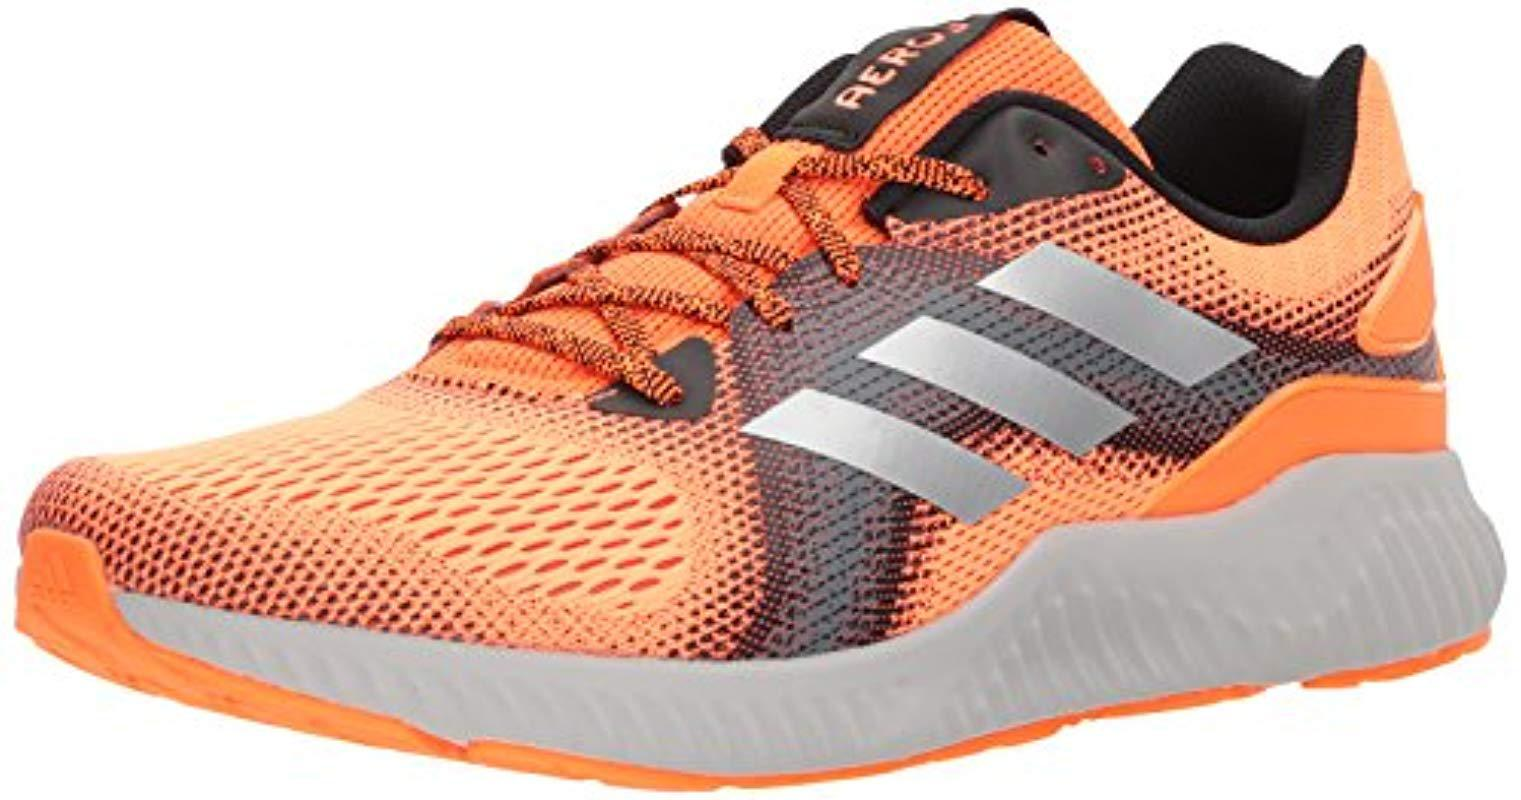 Lyst - adidas Aerobounce St M Running Shoe in Orange for Men - Save 17% 3c893f038